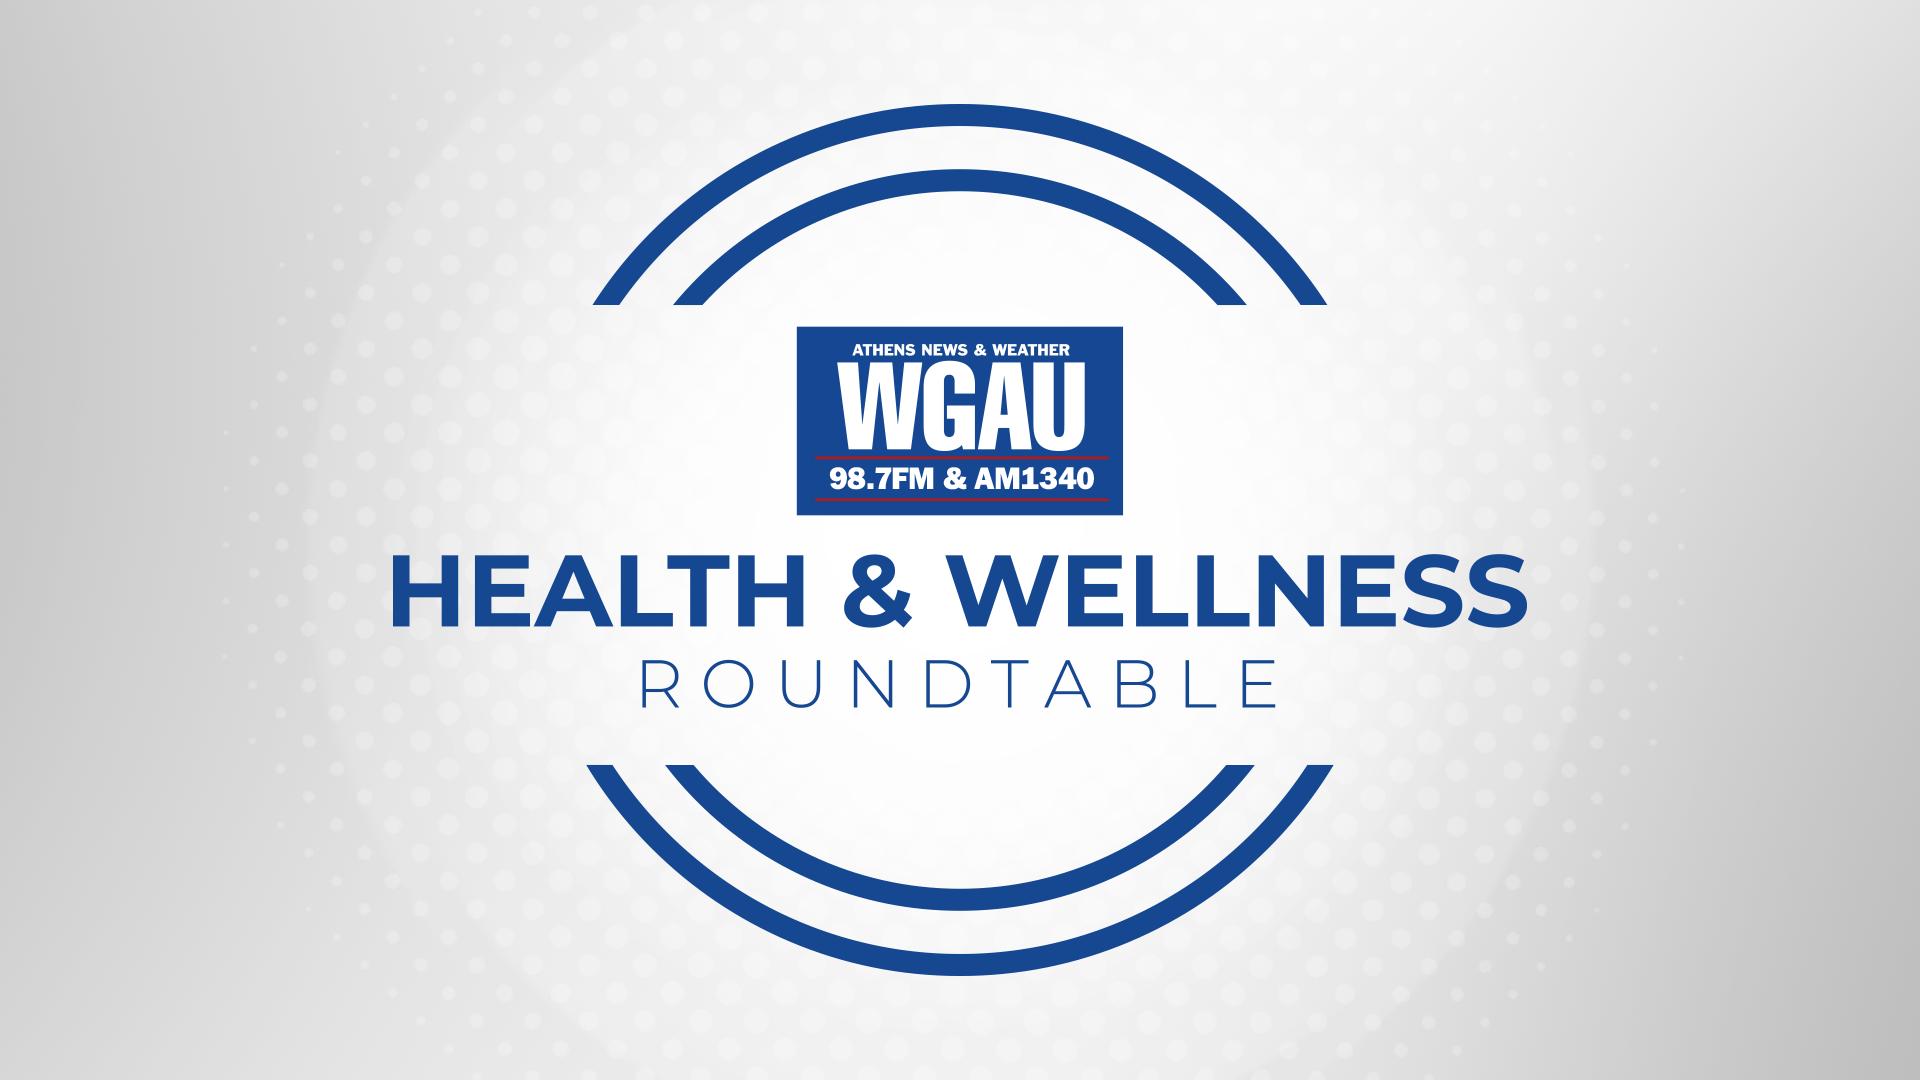 WGAU Health & Wellness Roundtable